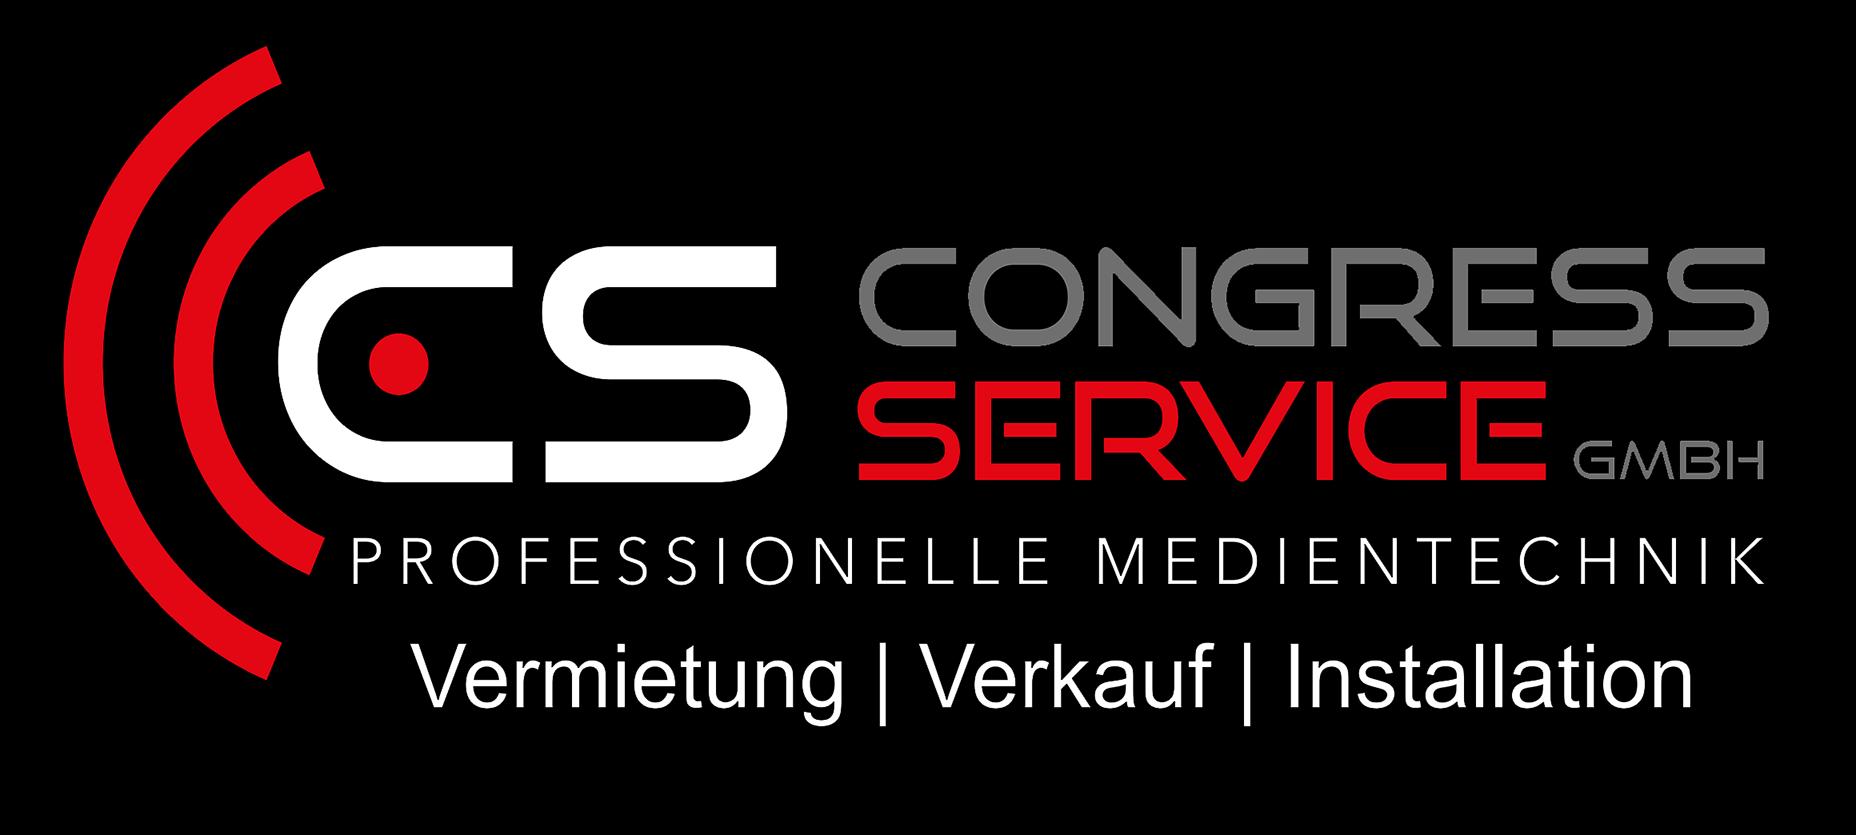 Congress Service